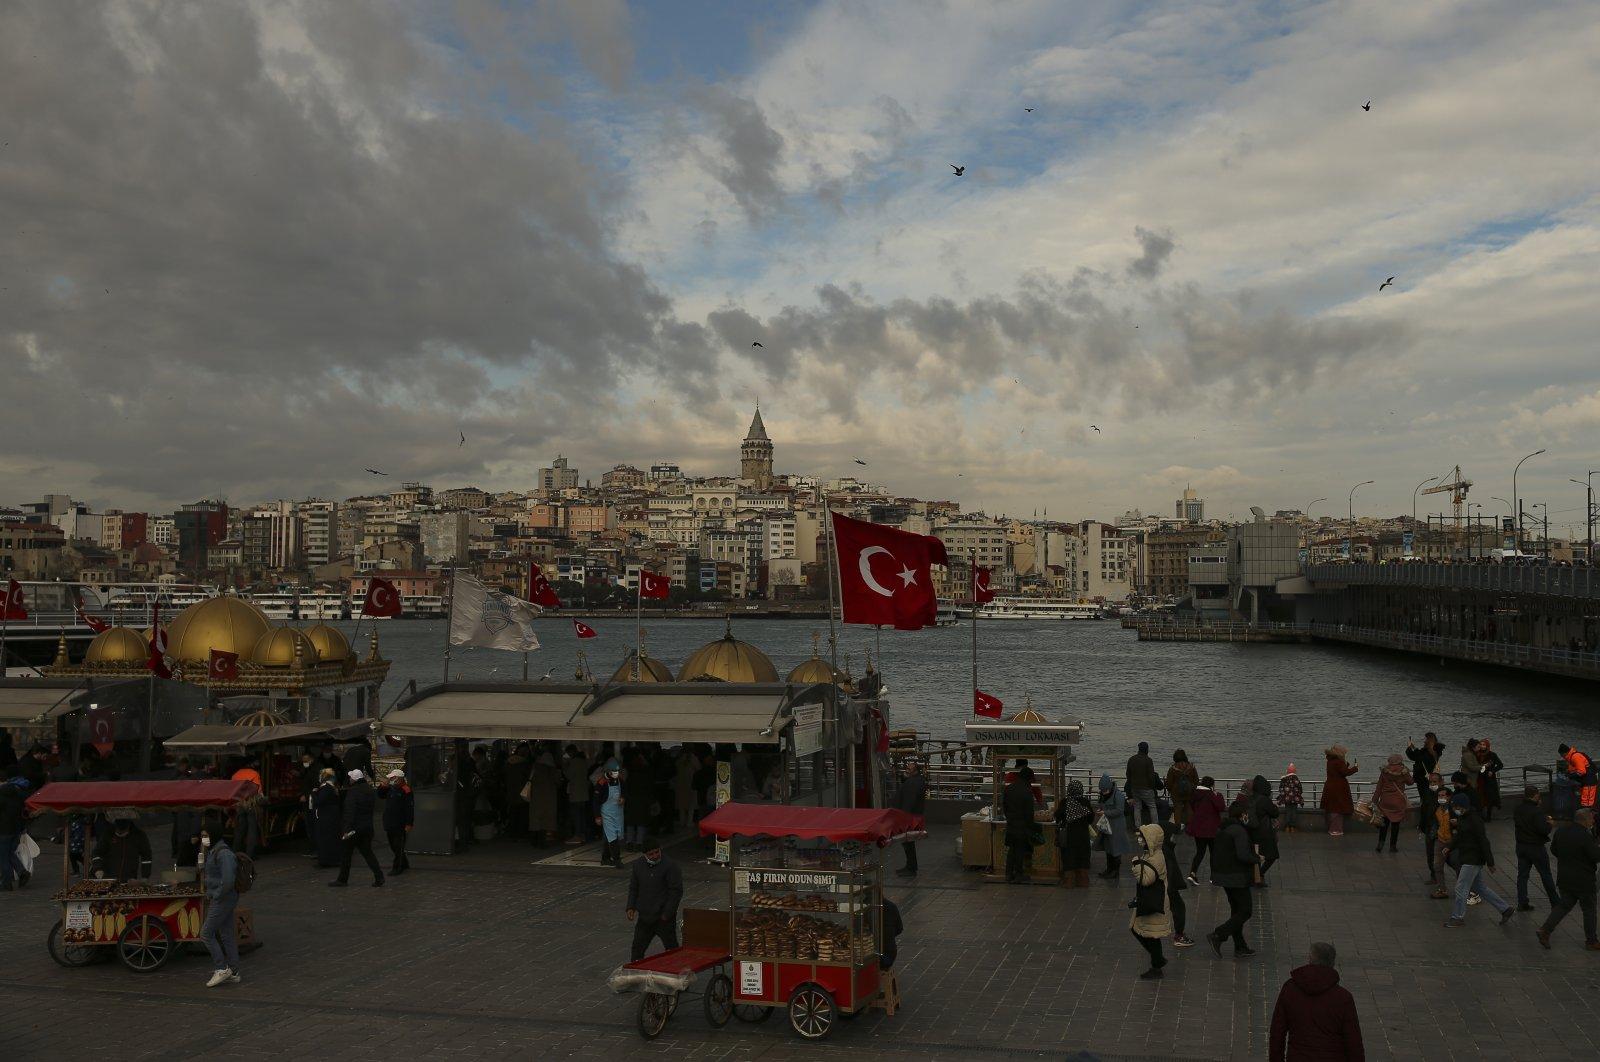 People wearing masks as protection against the coronavirus walk on Galata Bridge, Istanbul, Turkey, Jan. 29, 2021. (AP Photo)